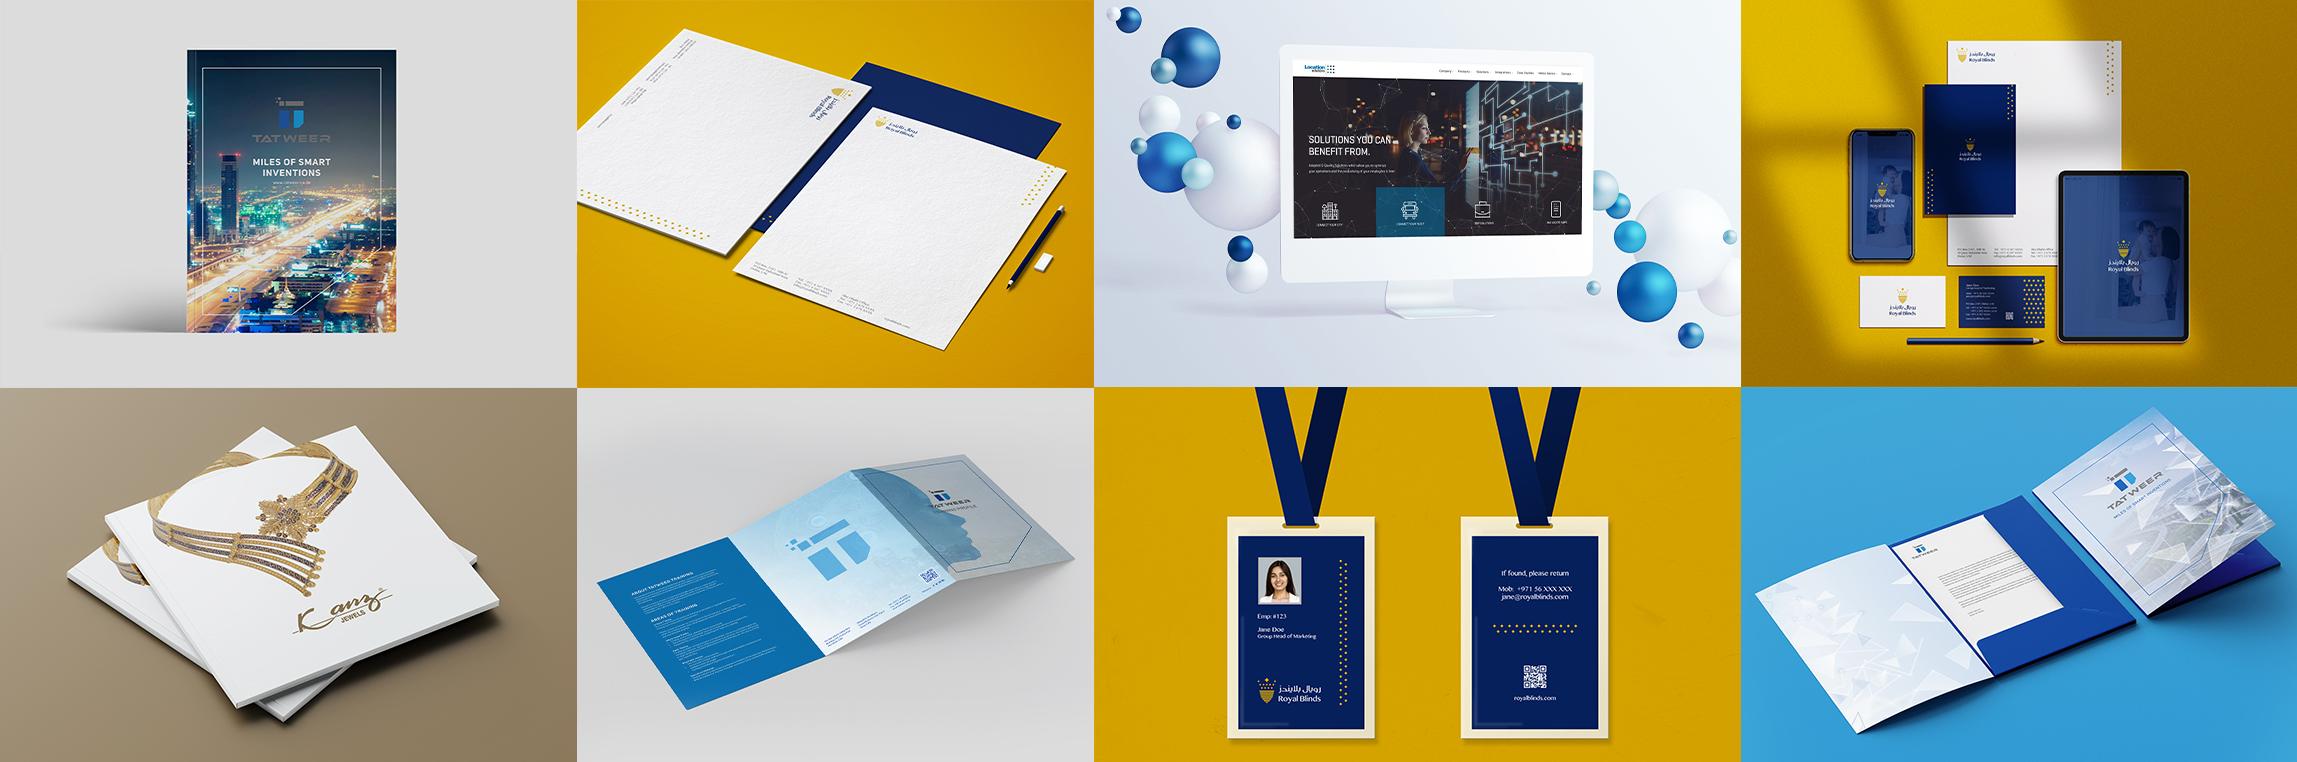 print-and-digital-v2